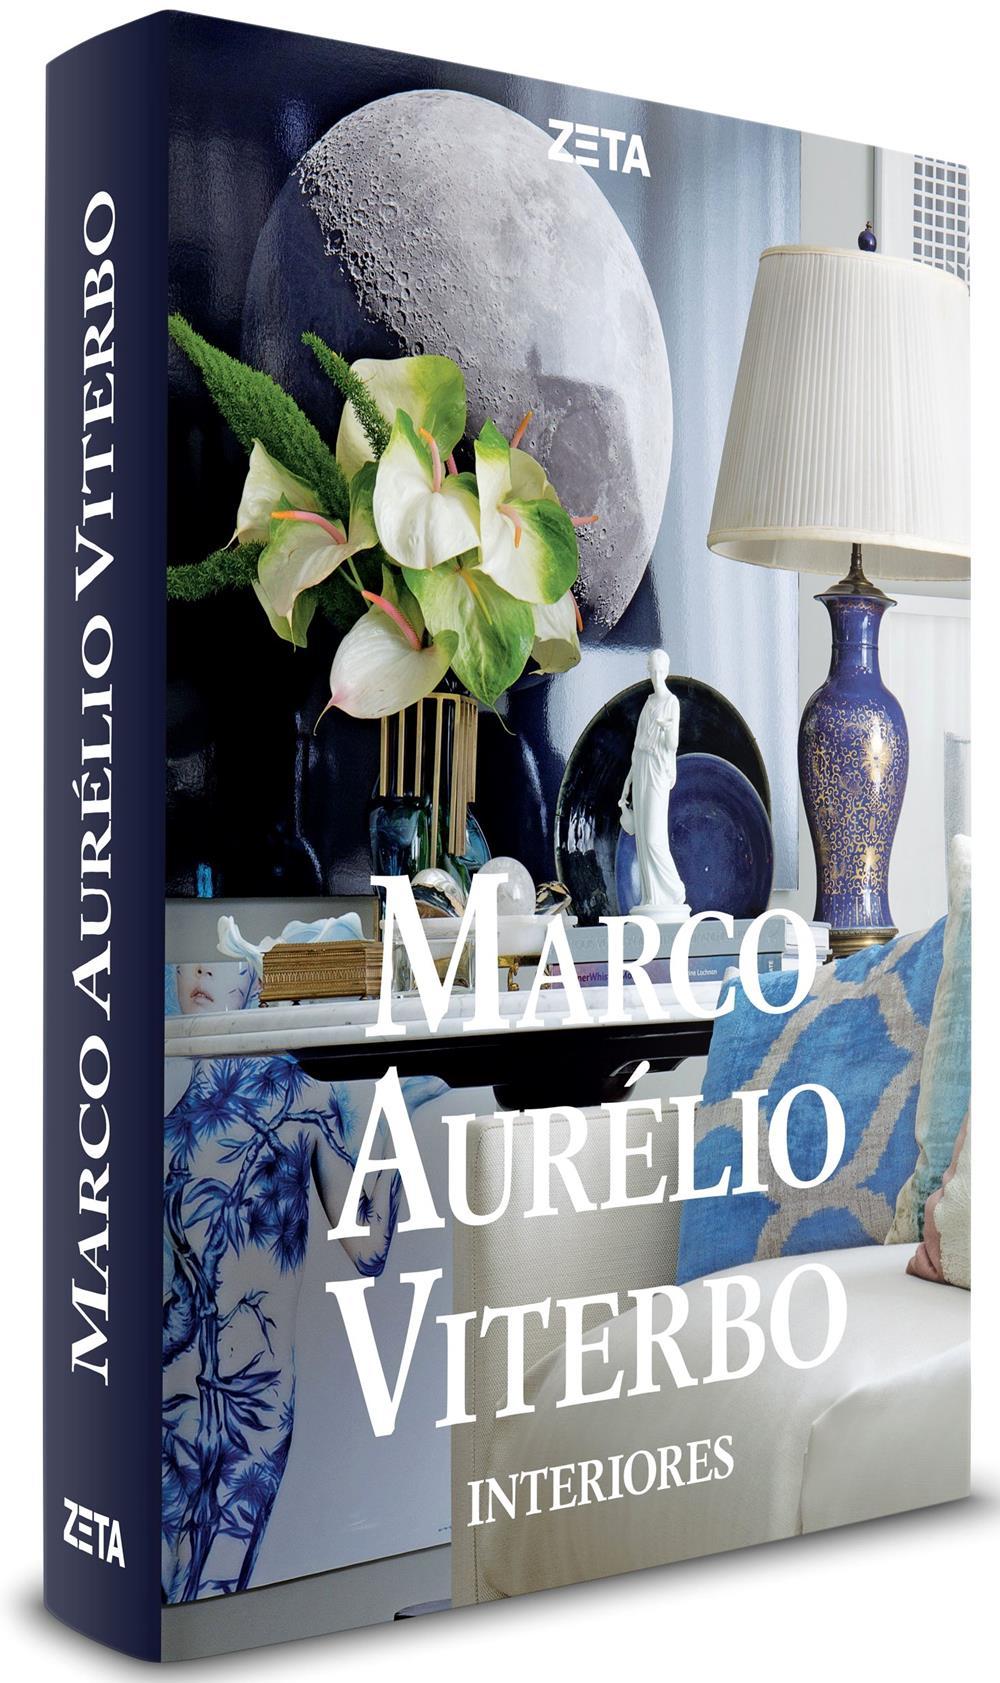 Capa do livro de Marco Aurelio Viterbo